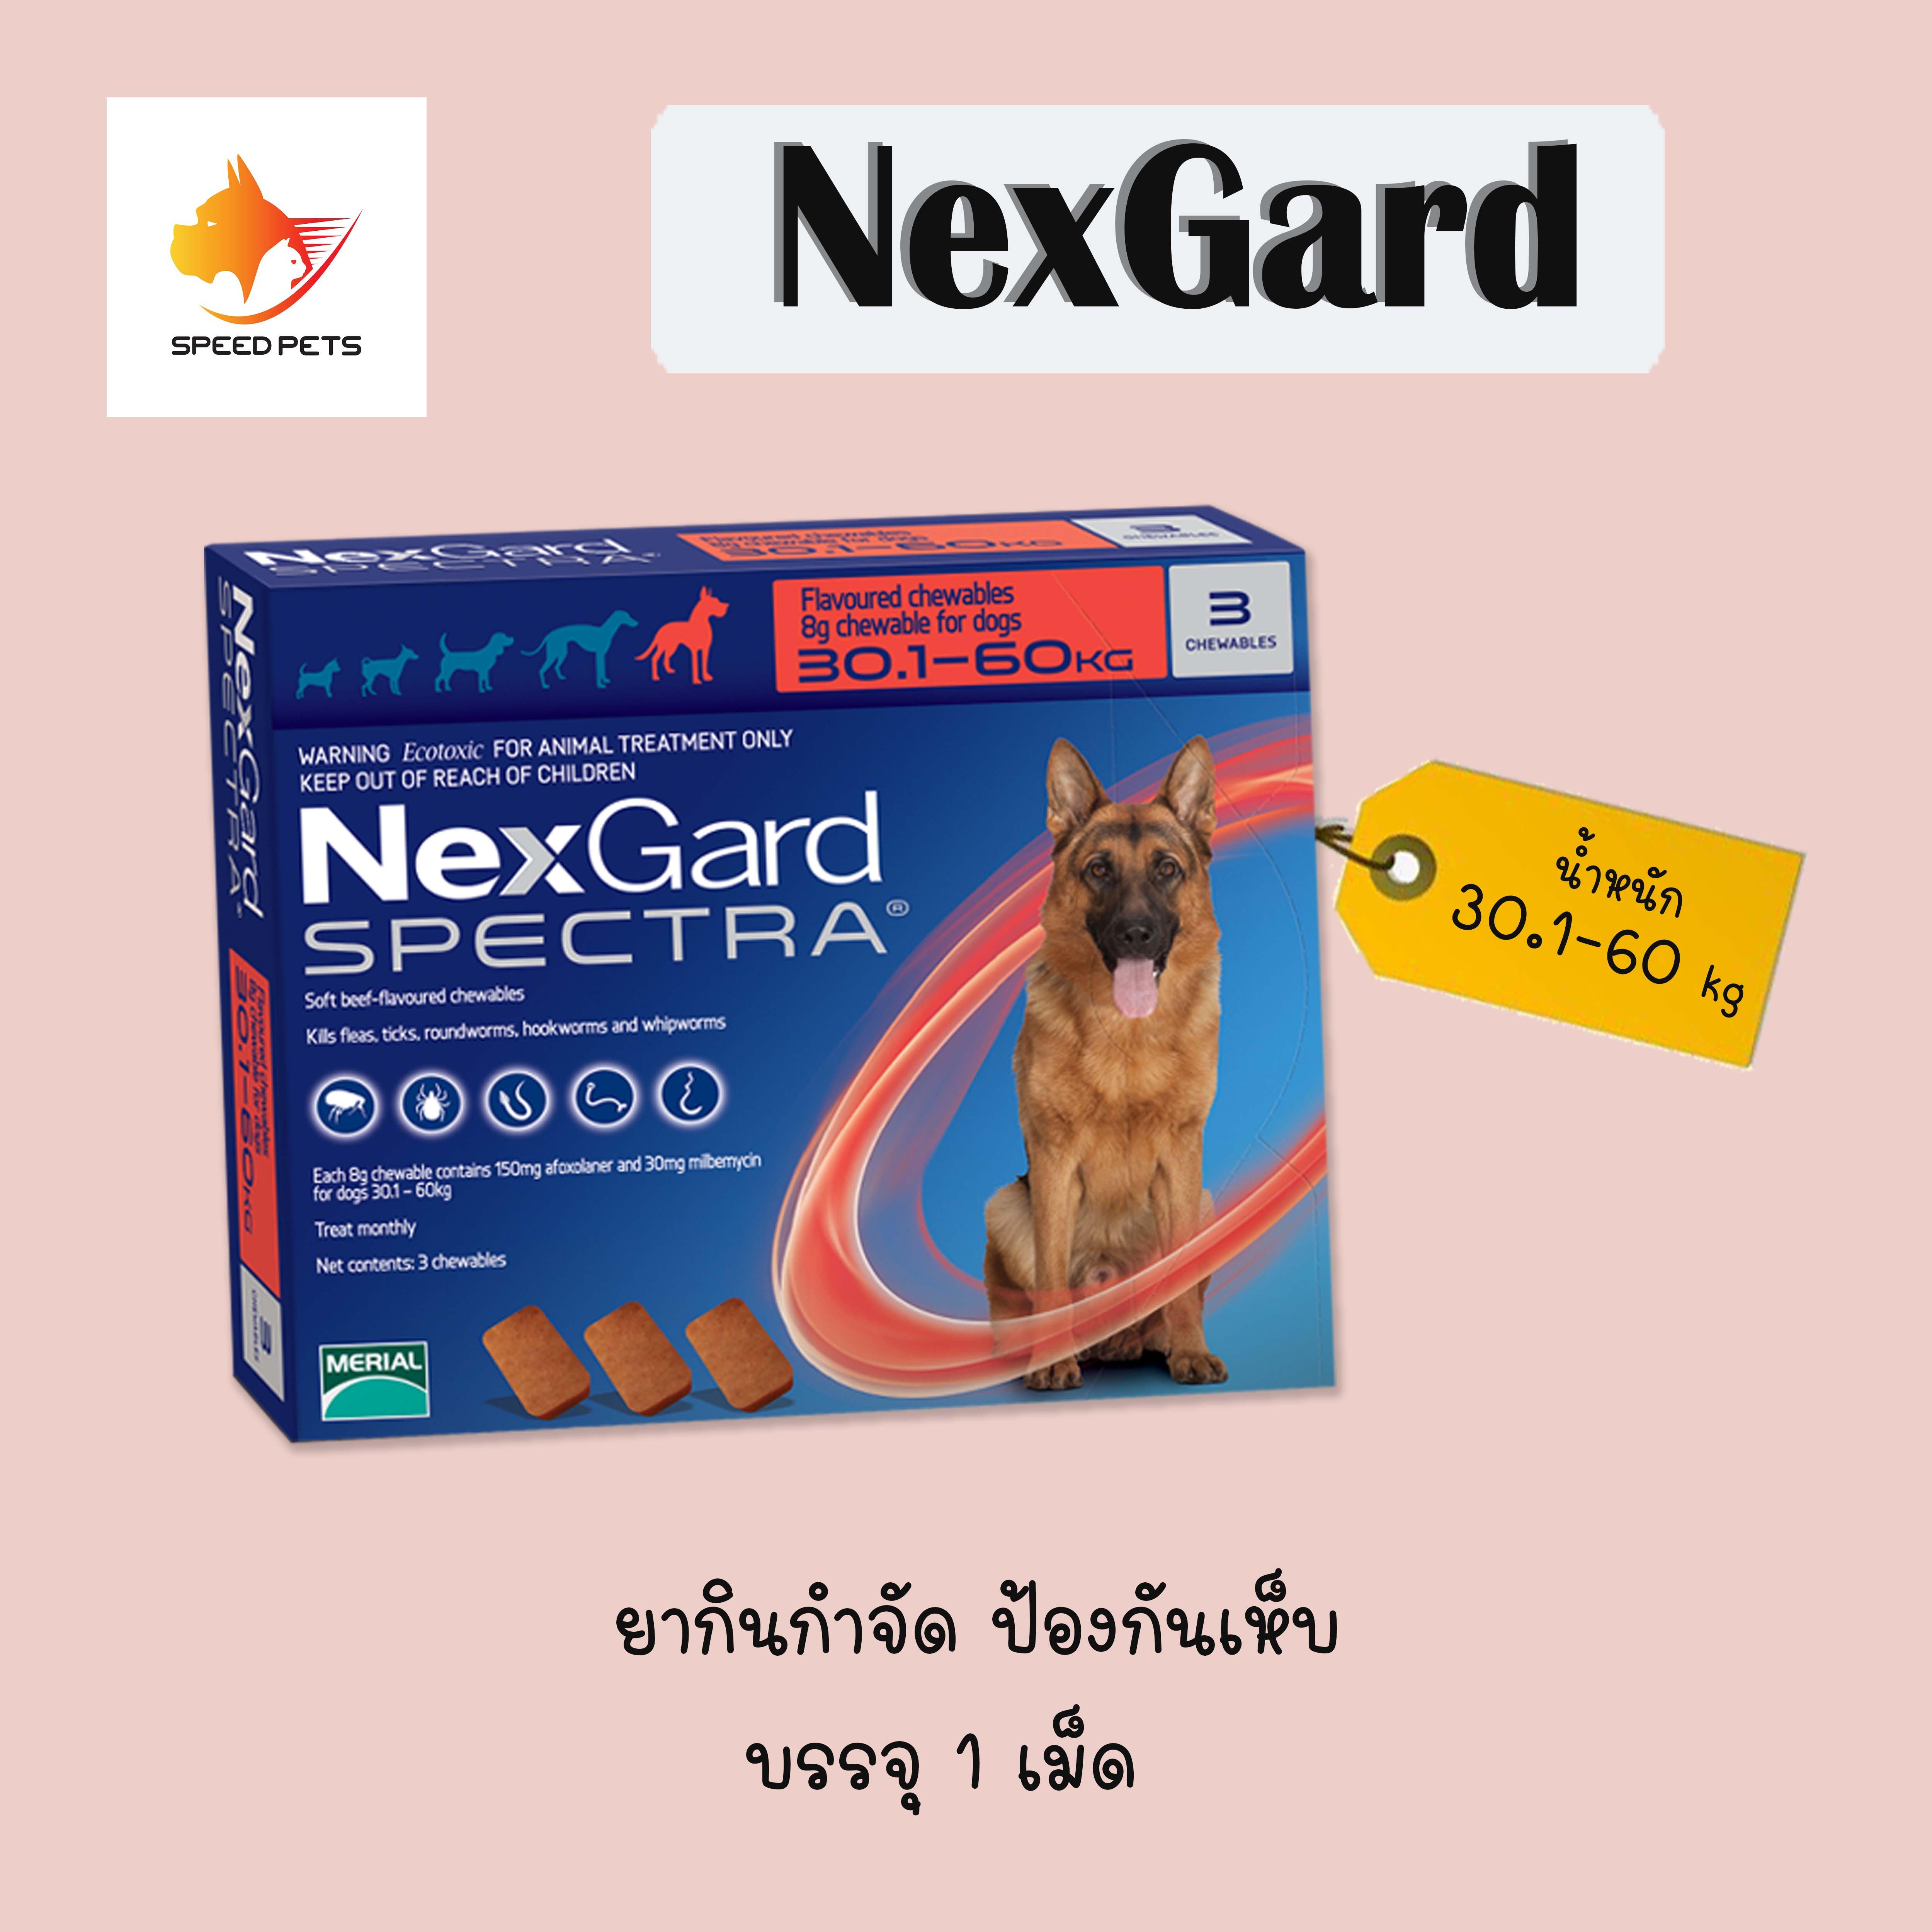 Nexgard Spectra Dog 30-60 Kg X 1 Tablet เห็บ หมัด 30-60 กก.( จำนวน 1 ชิ้น / เม็ด ) Exp 10-2022.